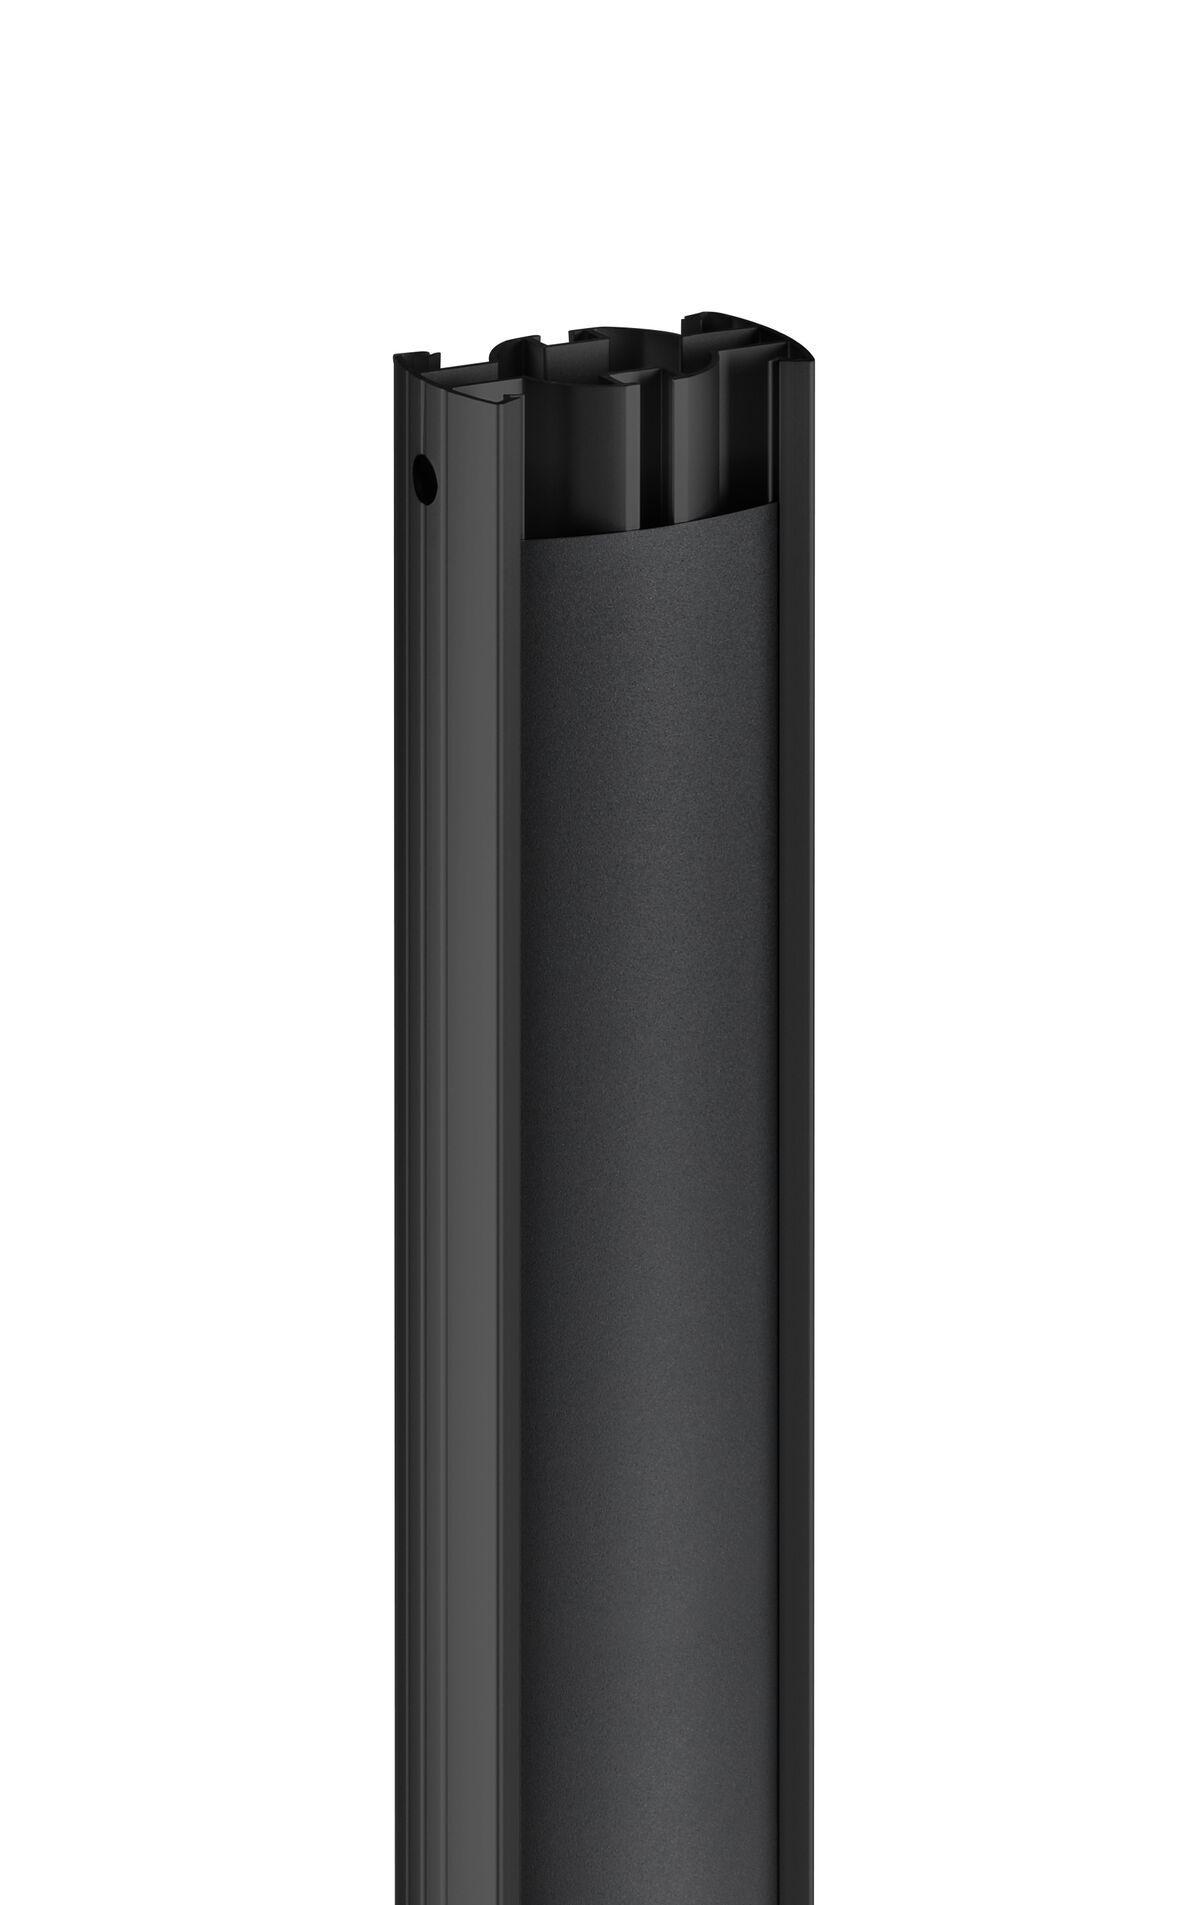 Vogel's PUC 2515 Tubo 150 cm negra - Product